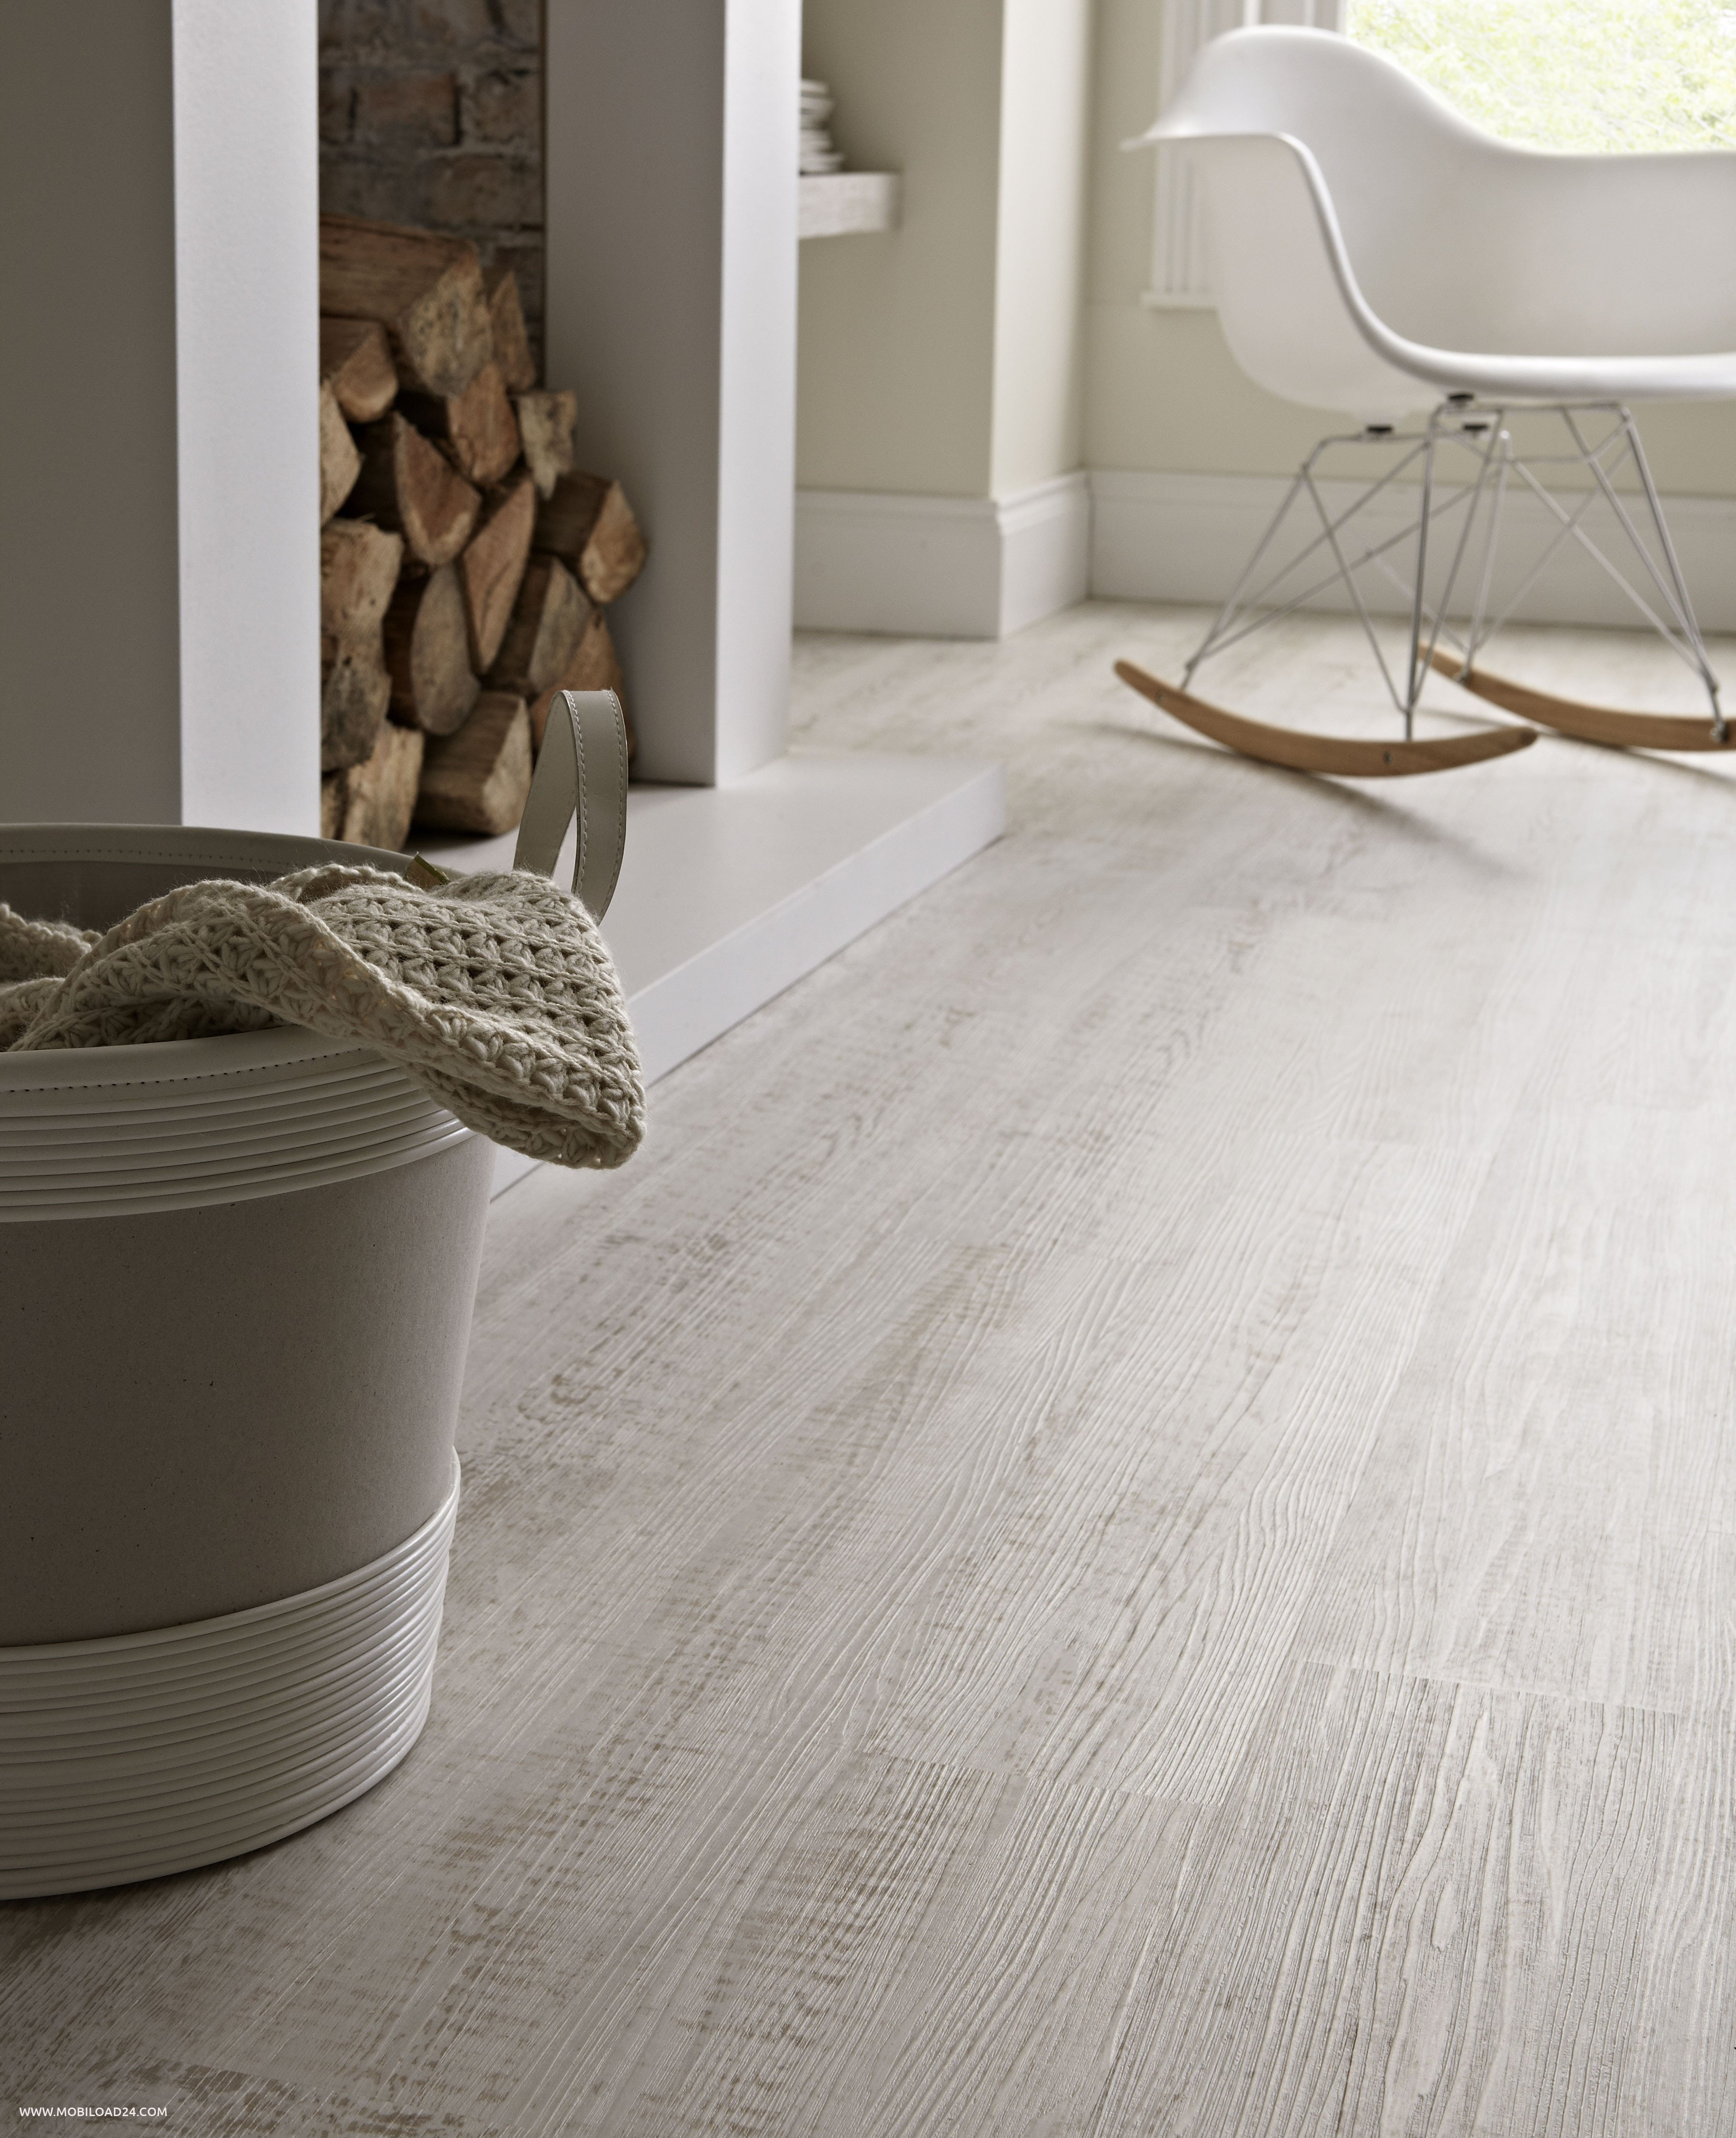 hardwood flooring 2017 of ideas white washed hardwood floors mobiload24 new furniture ideas 2017 inside grey hardwood floors bedroom beautiful white washed engineered wood